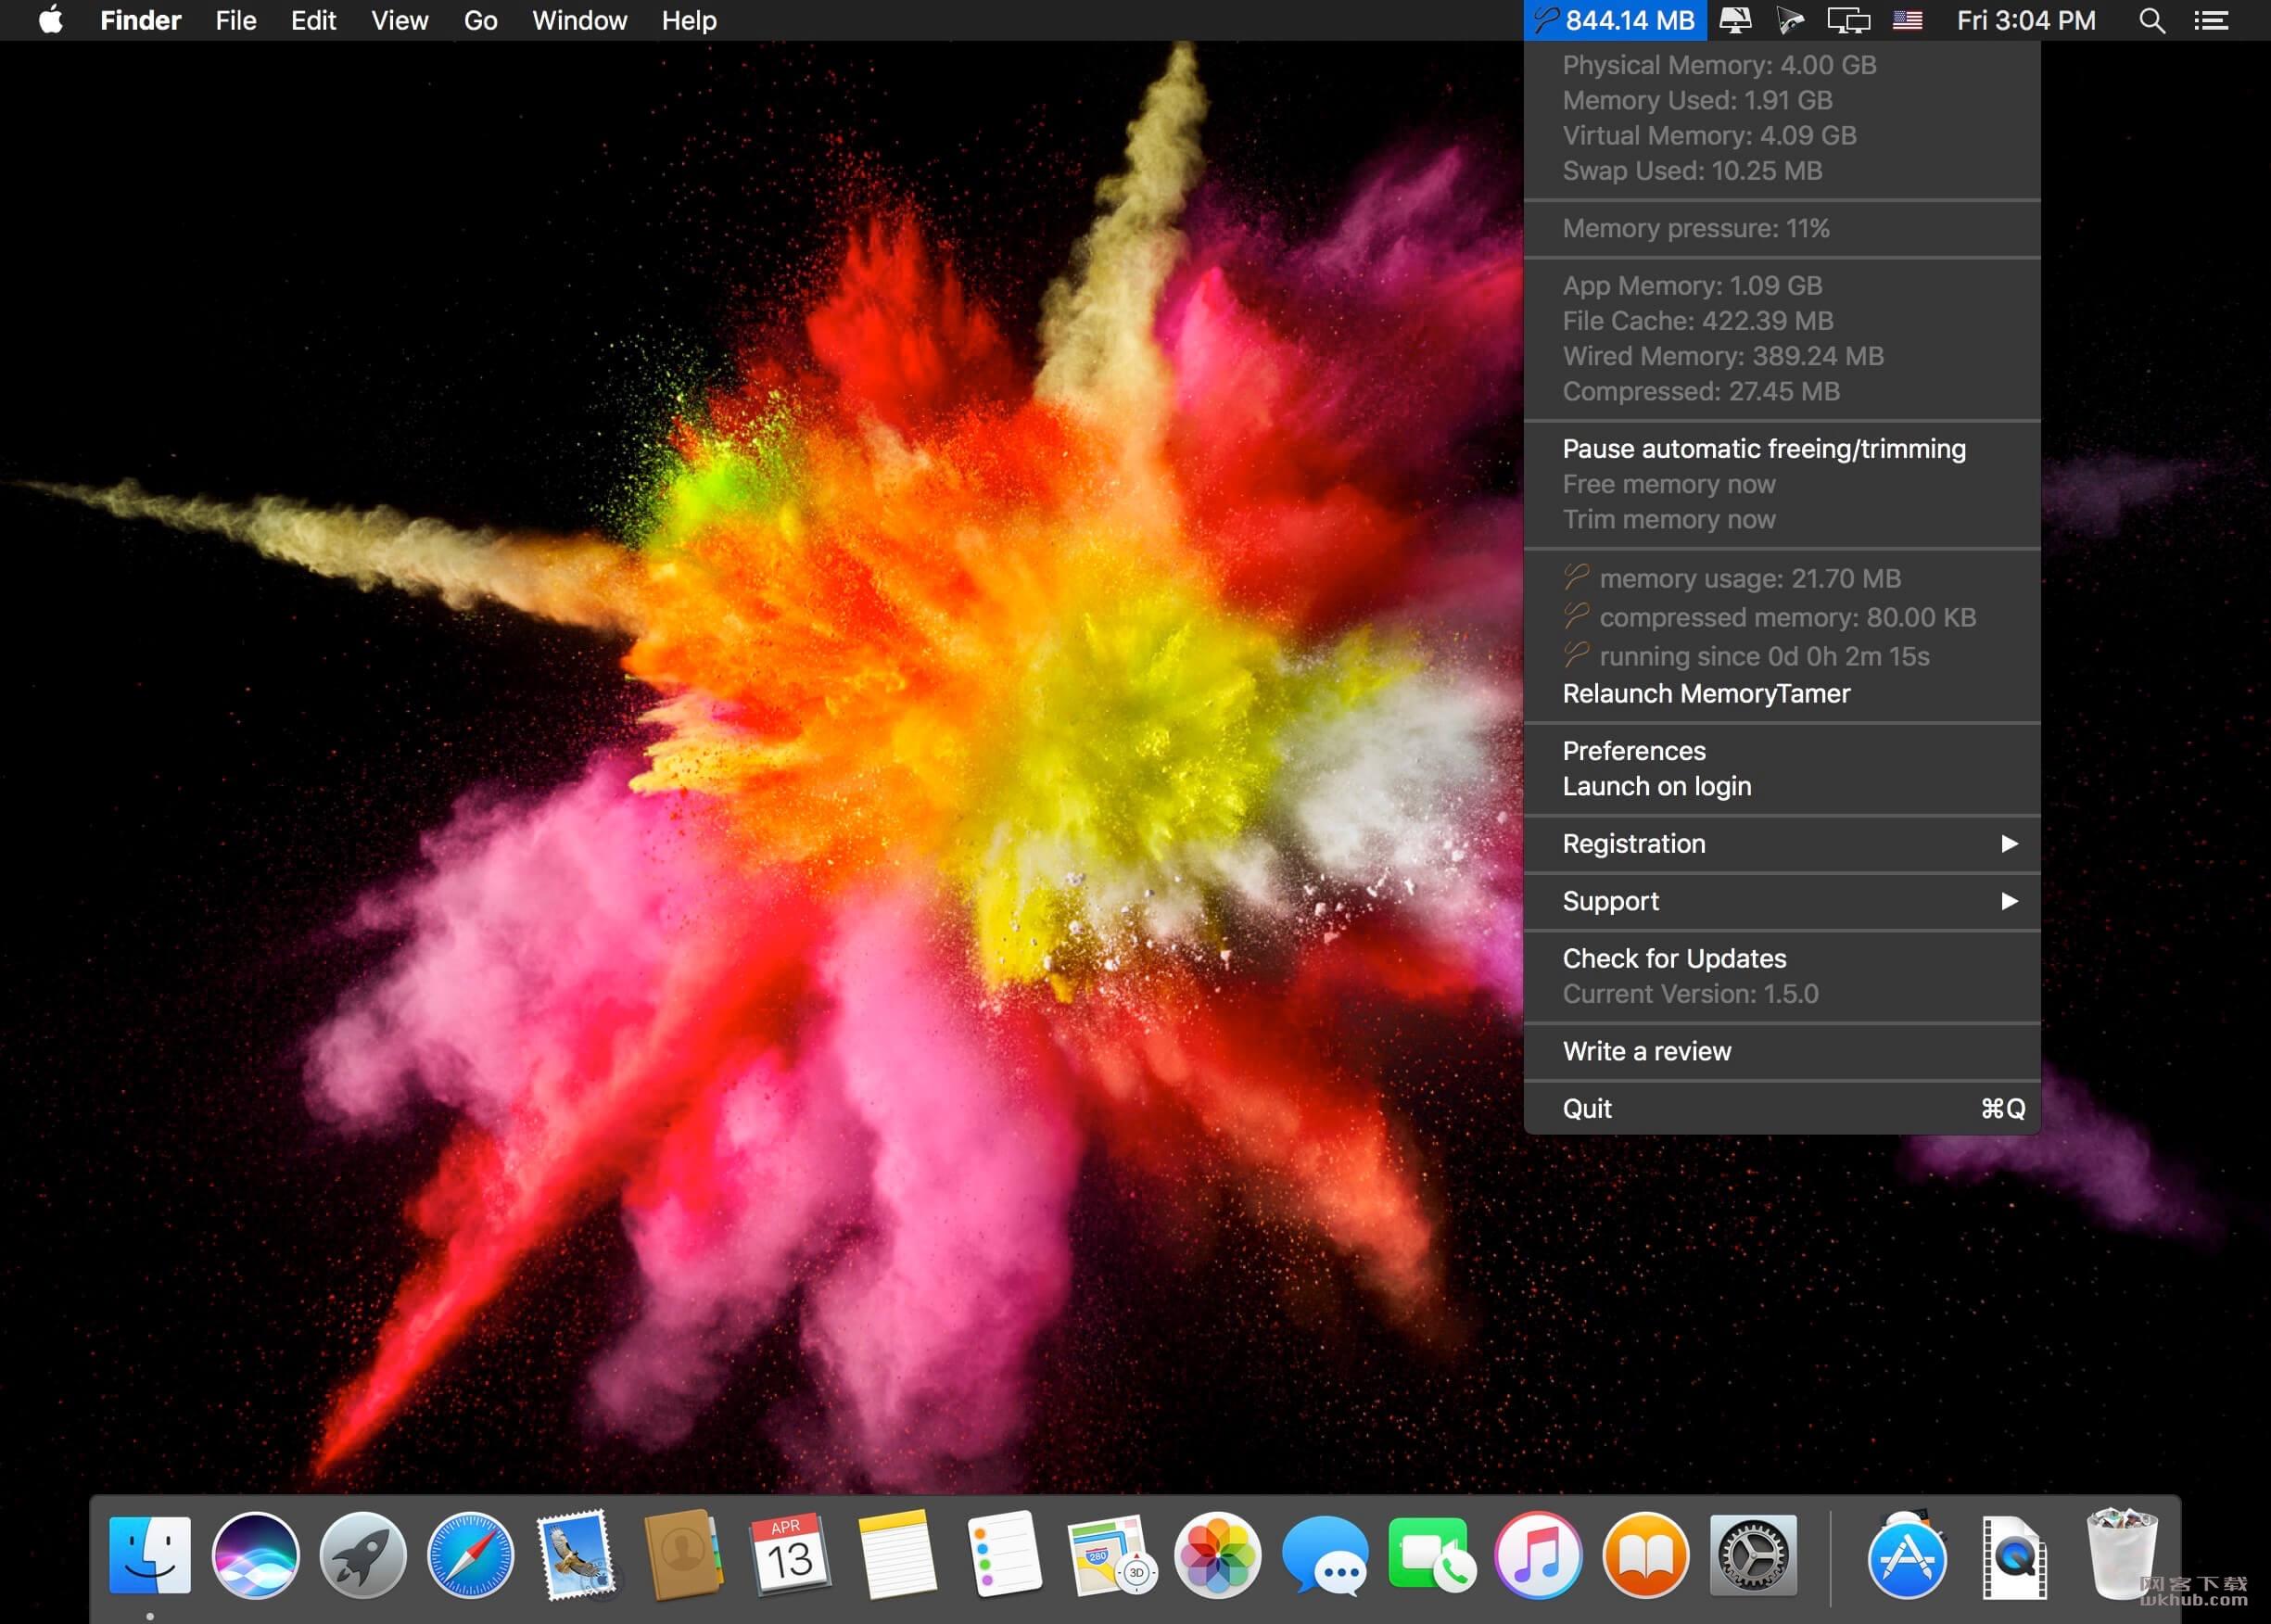 MemoryTamer 1.5.2 内存释放工具